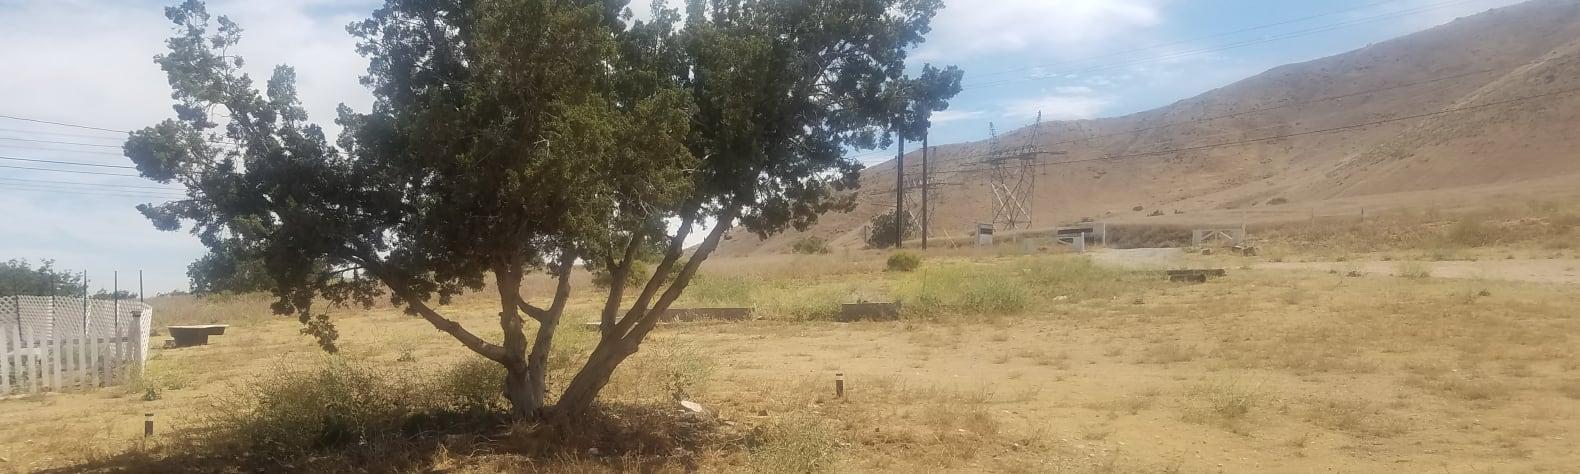 Angeles Sierra Stagecoach Depot